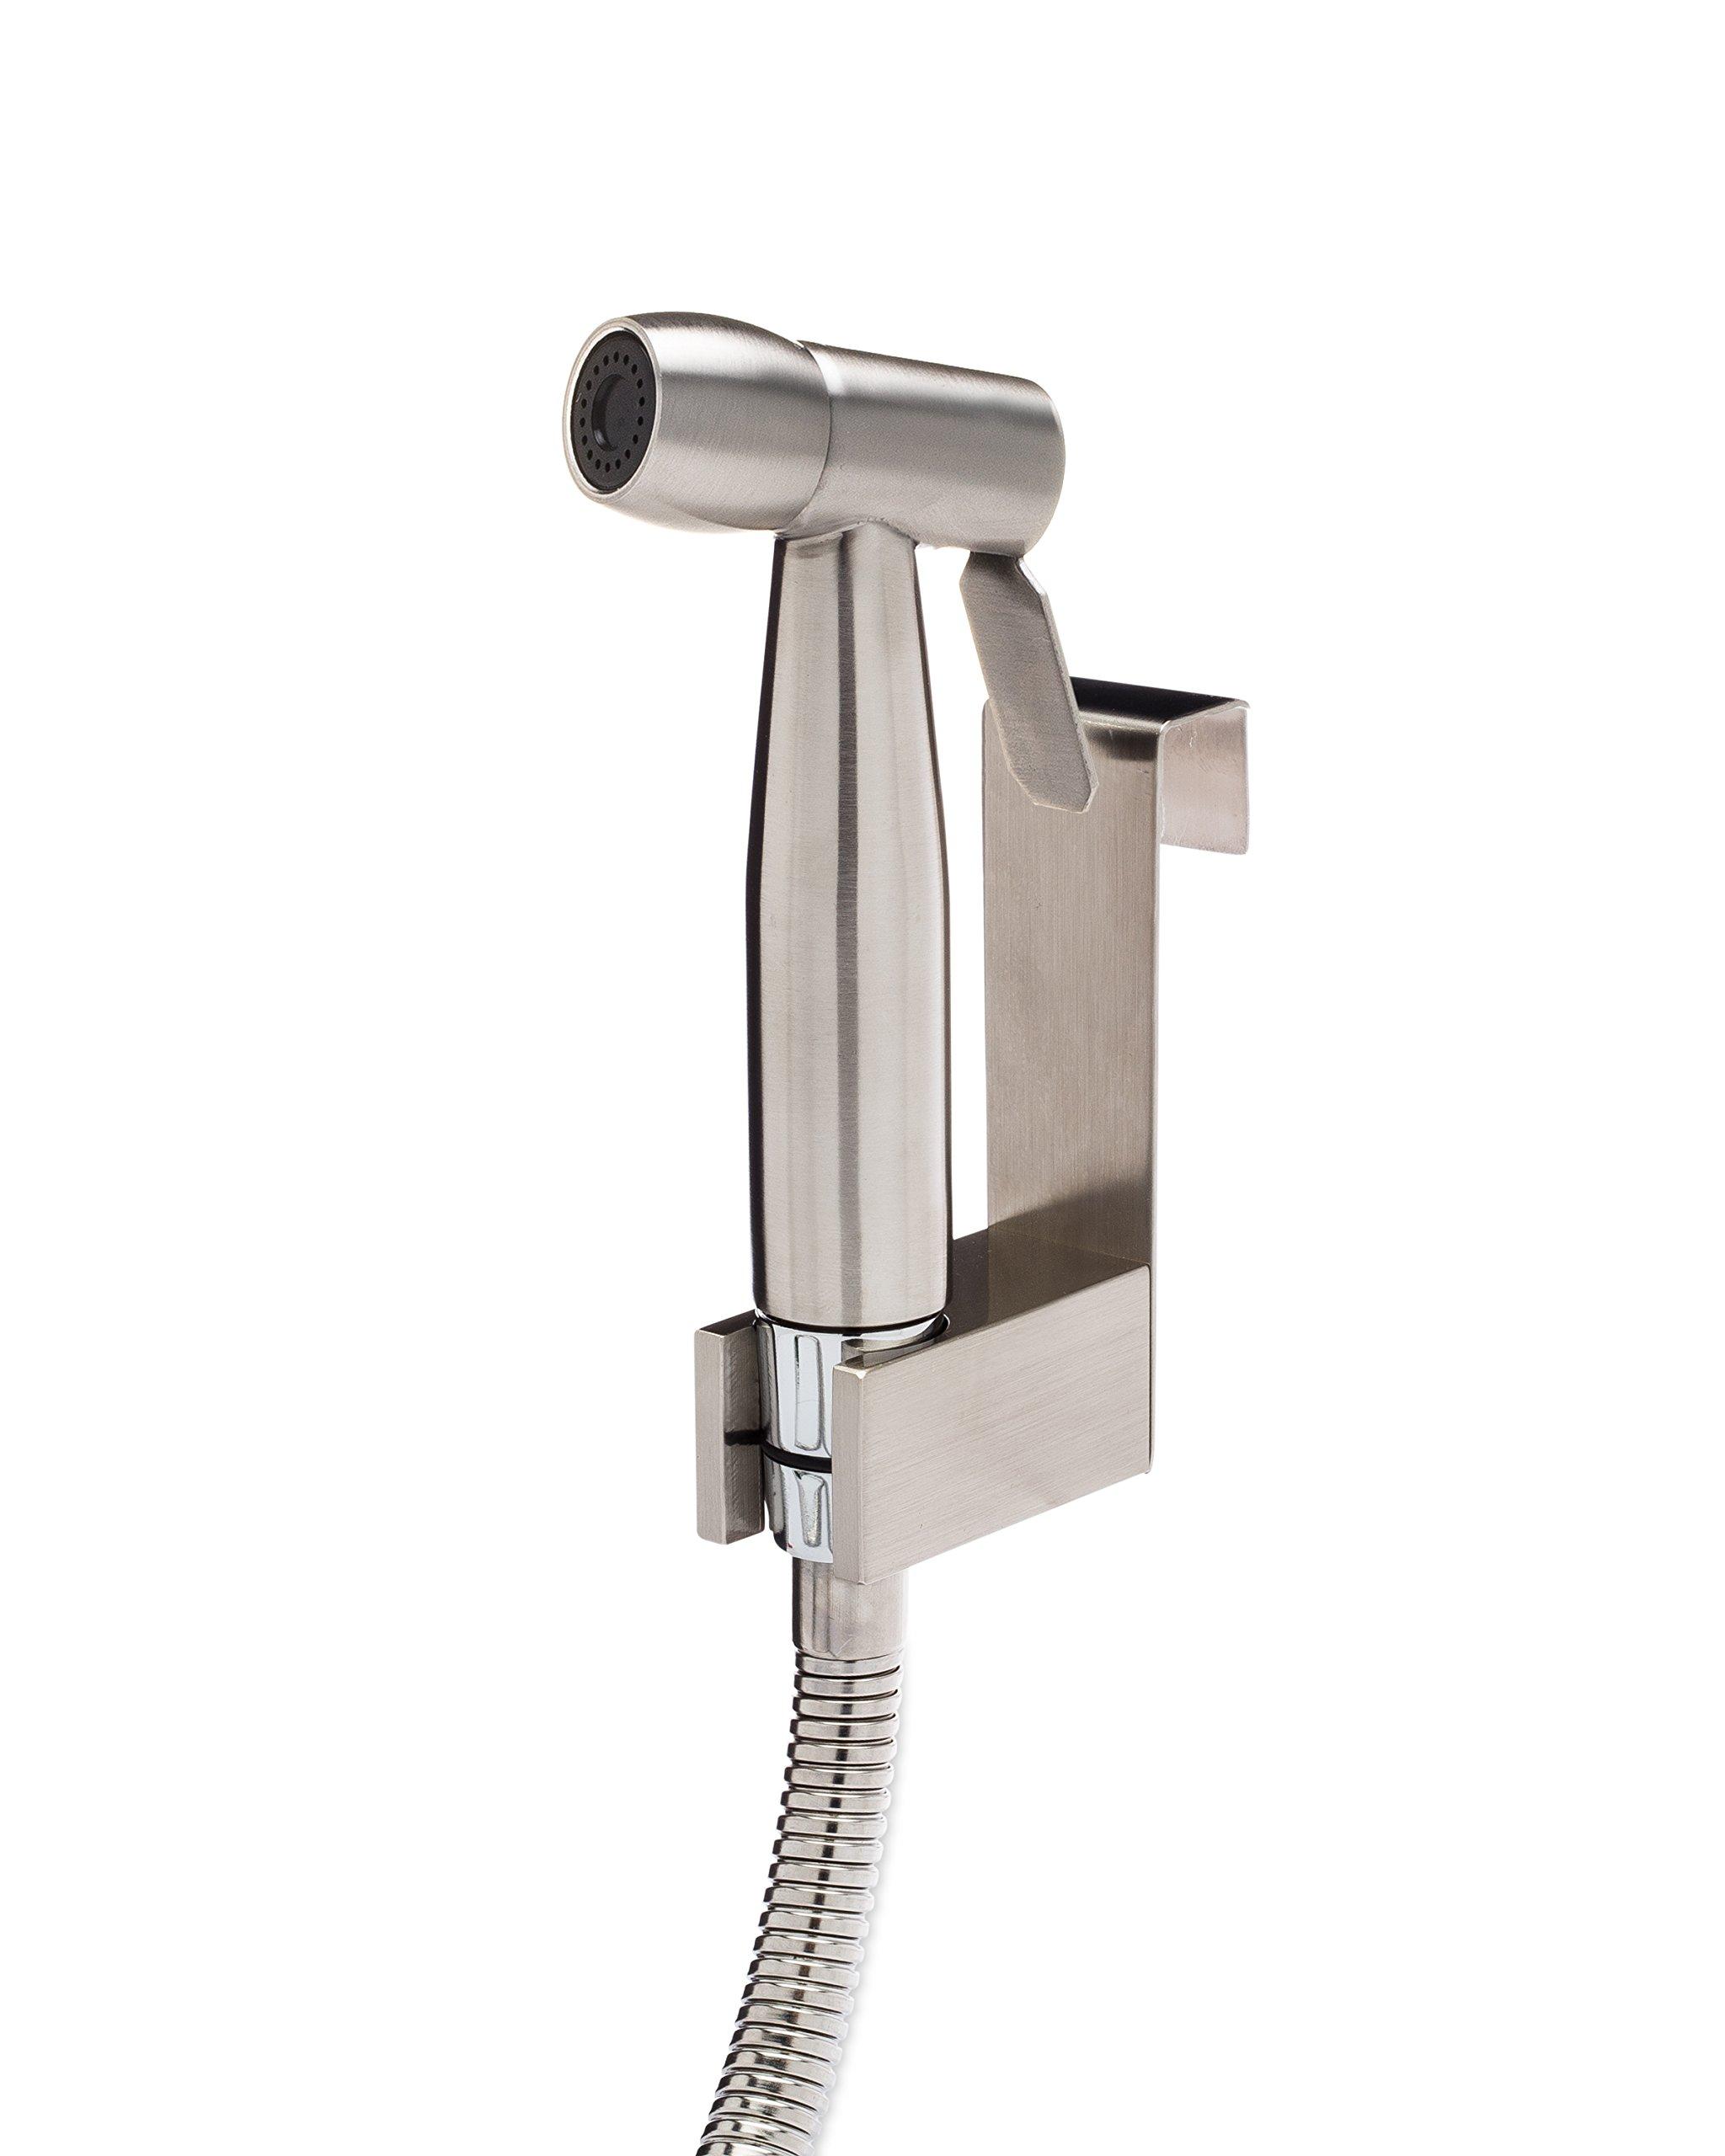 SmarterFresh Cloth Diaper Sprayer, Premium Stainless Steel Diaper Sprayer for Toilet - Diaper Washer Hand Held Bidet Sprayer for Cloth Diapers